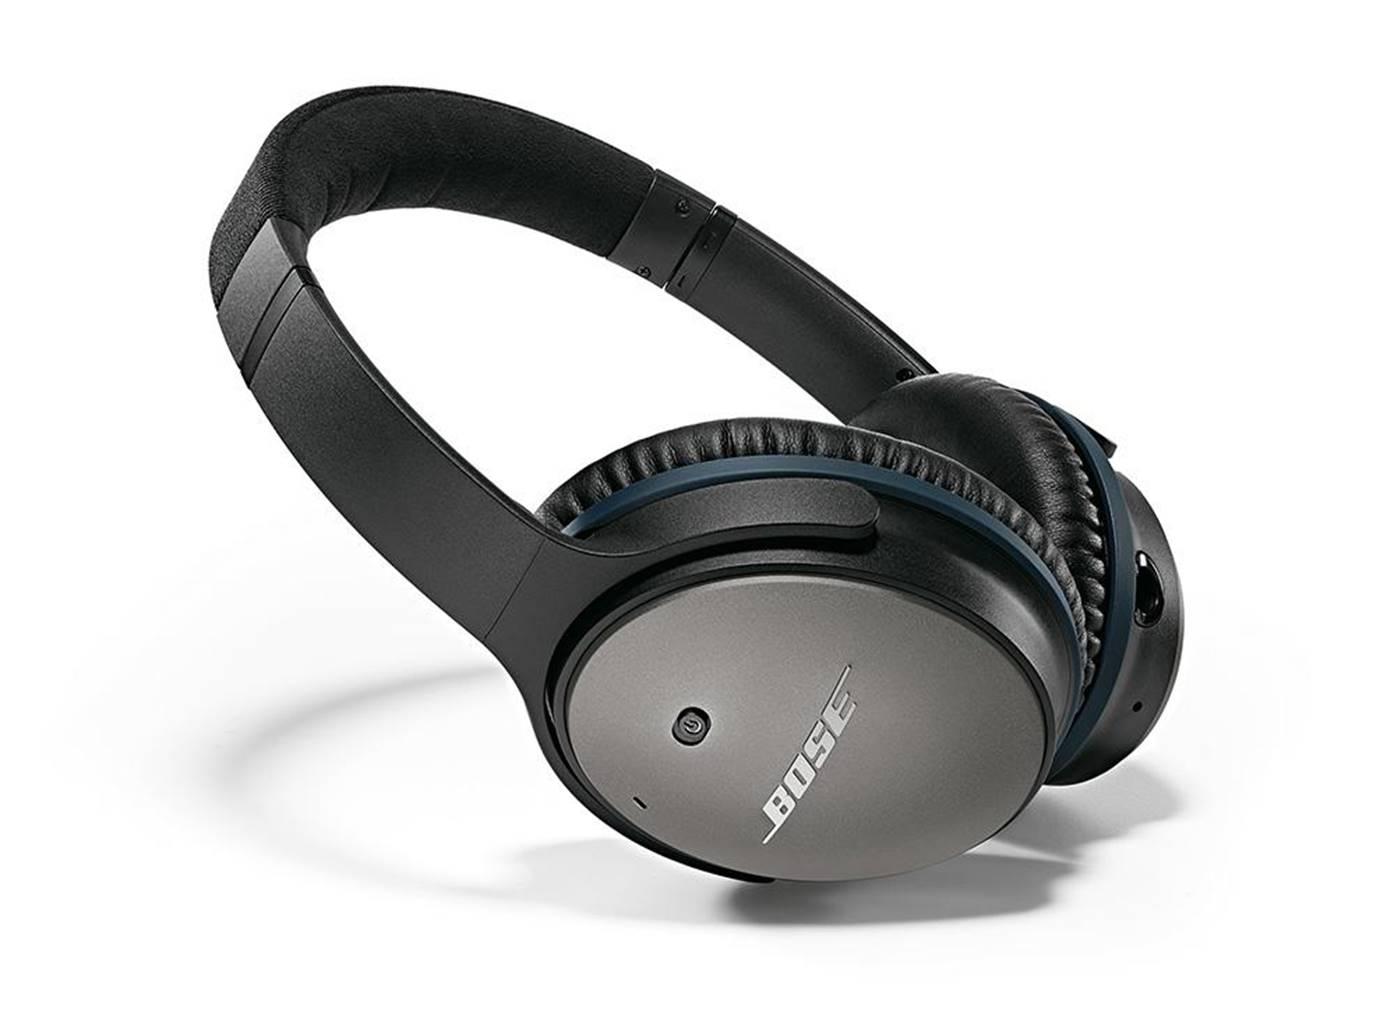 Bose QuietComfort 25 Noise Cancelling Headphones